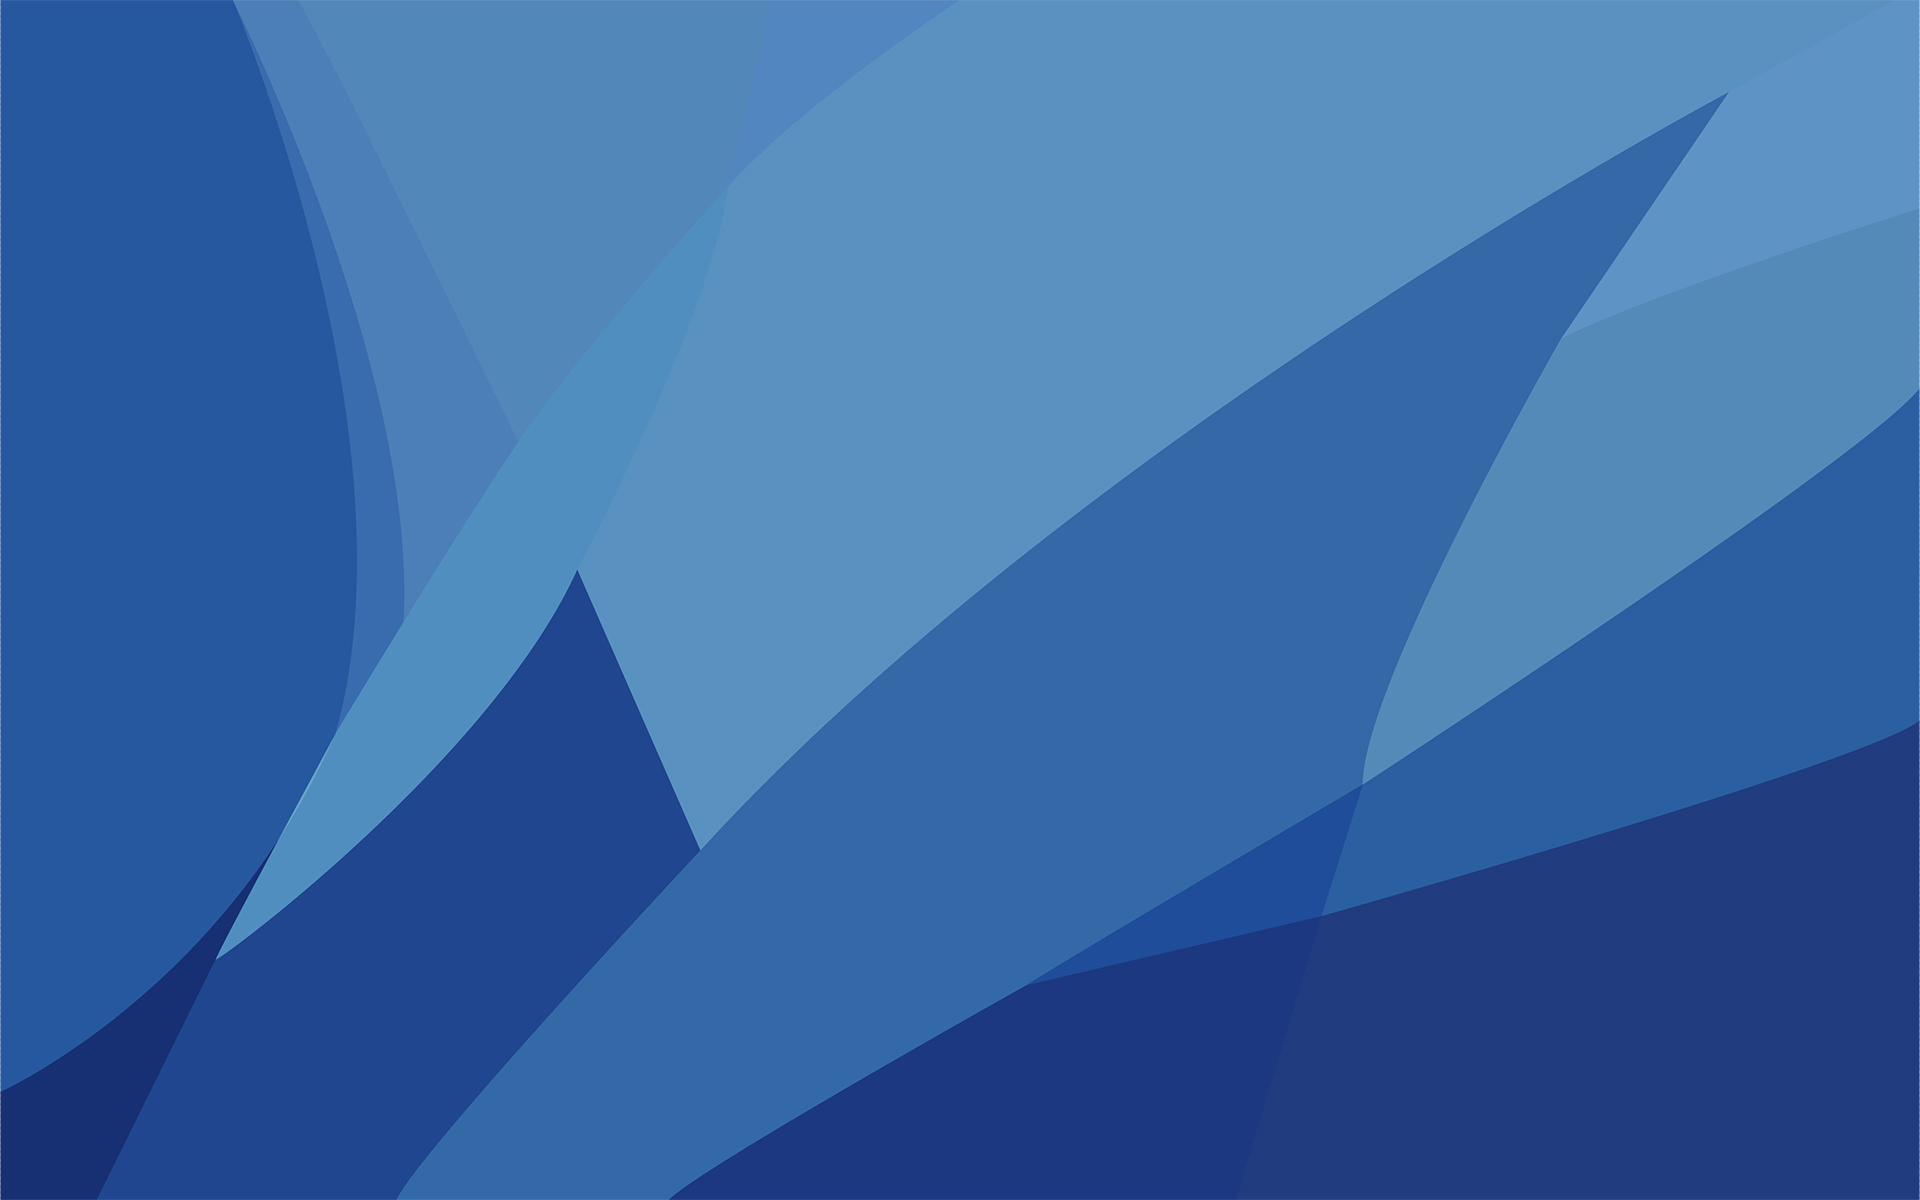 Mac Wallpaper - Flat Colors - 1920x1200 by dAKirby309